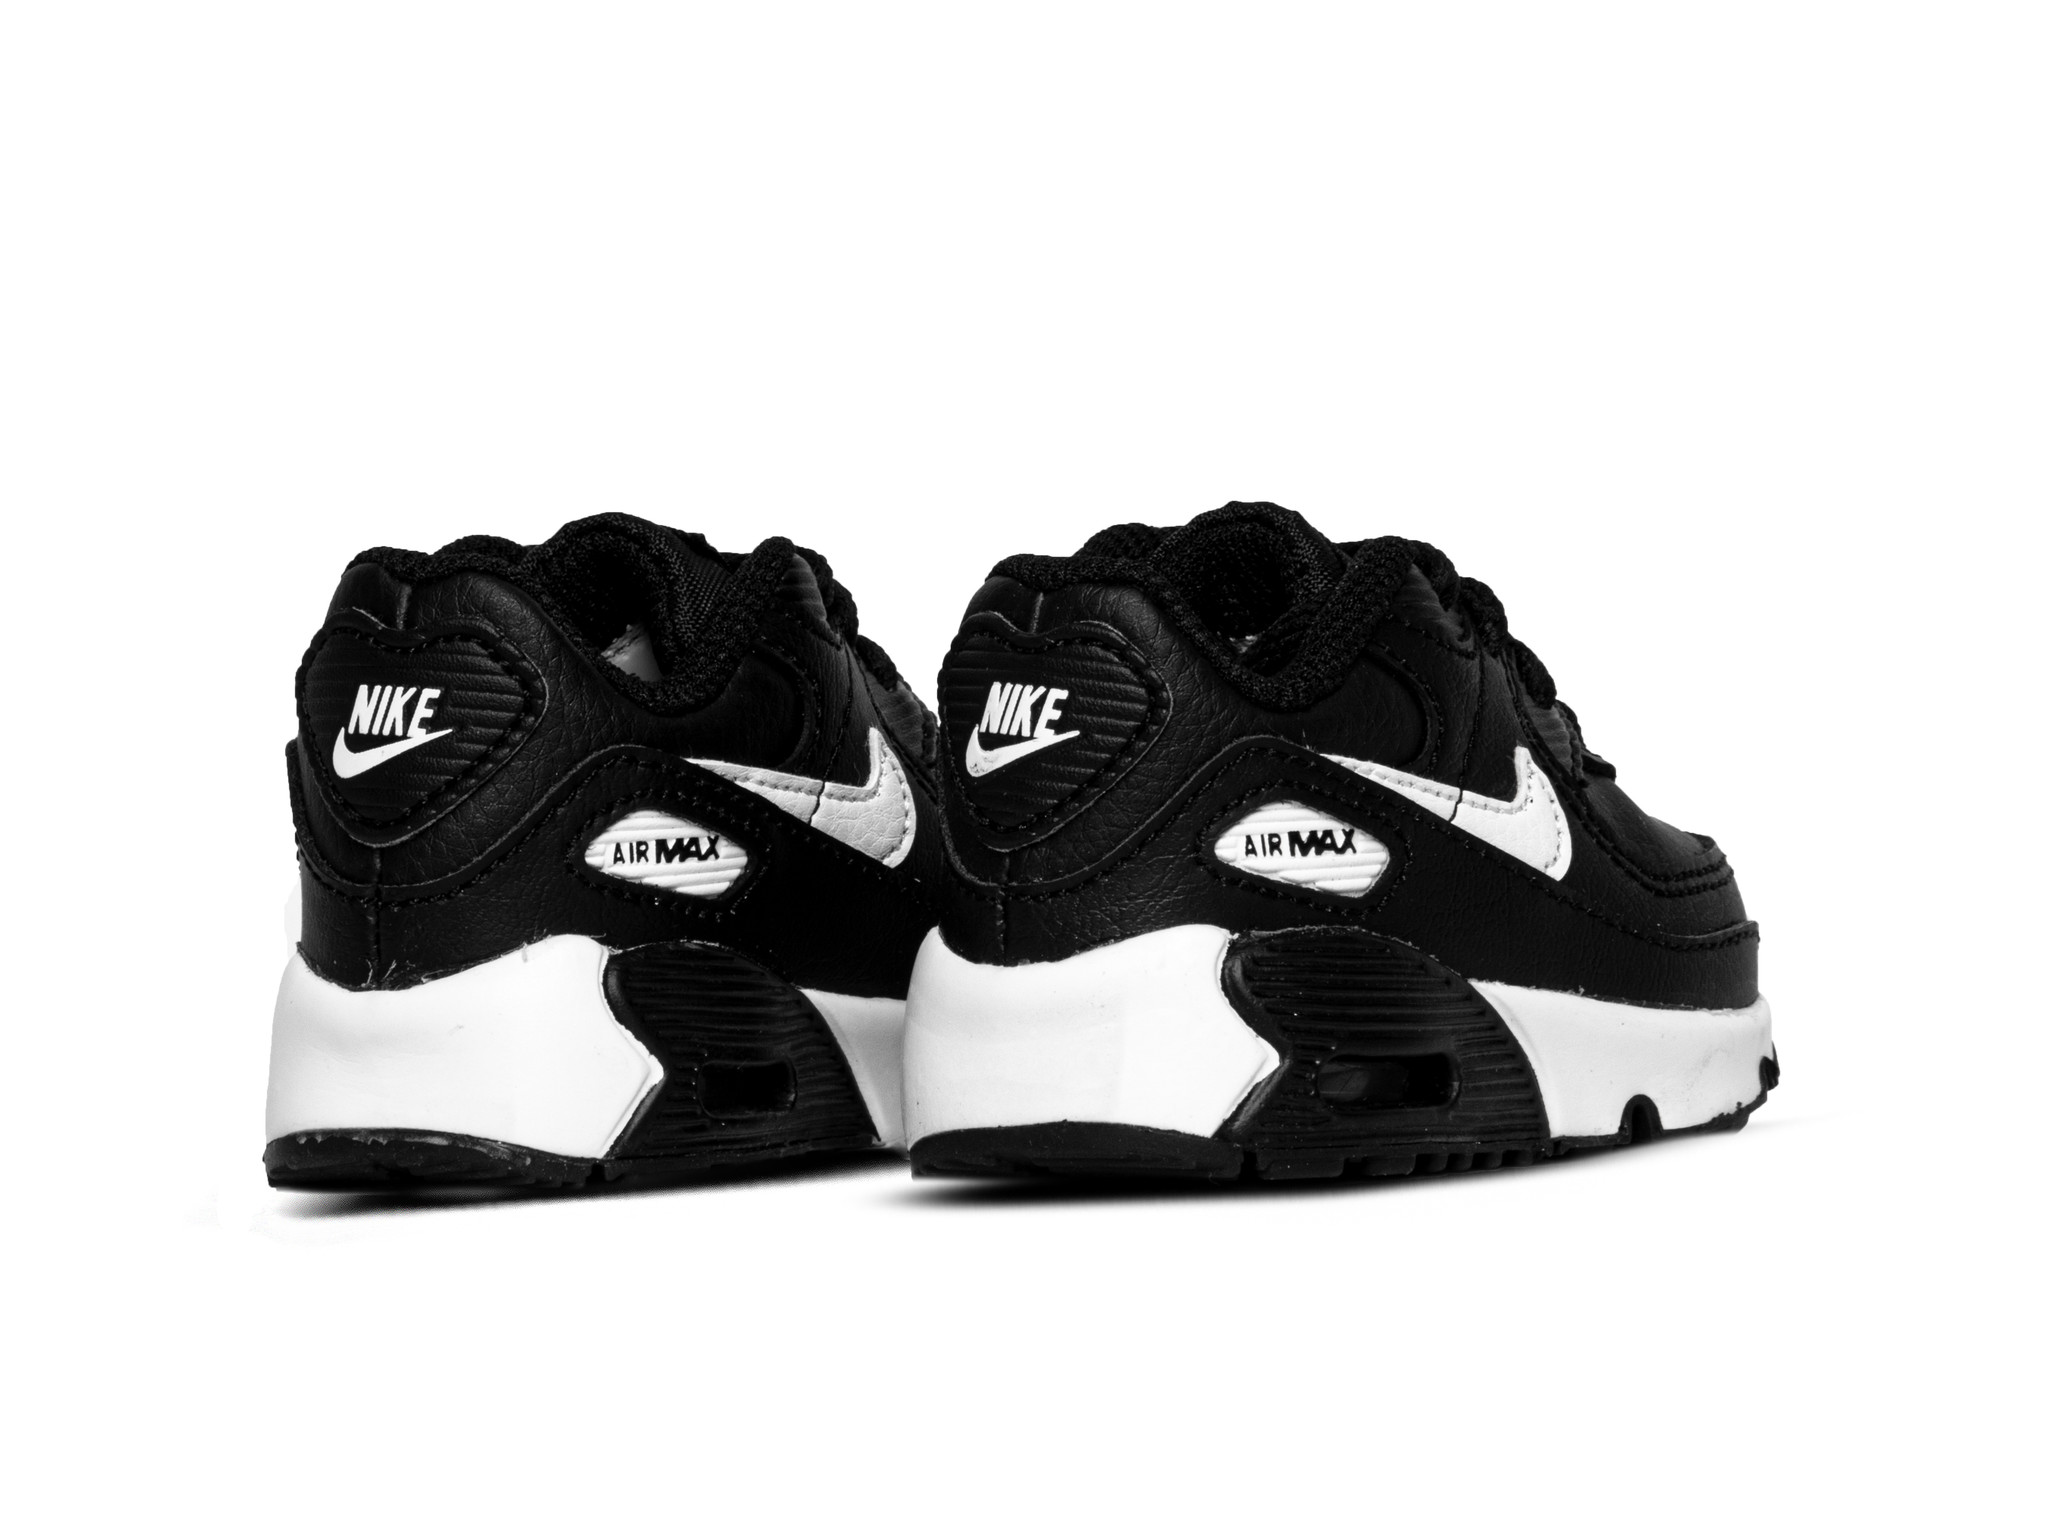 Nike Air Max 90 Black White Black